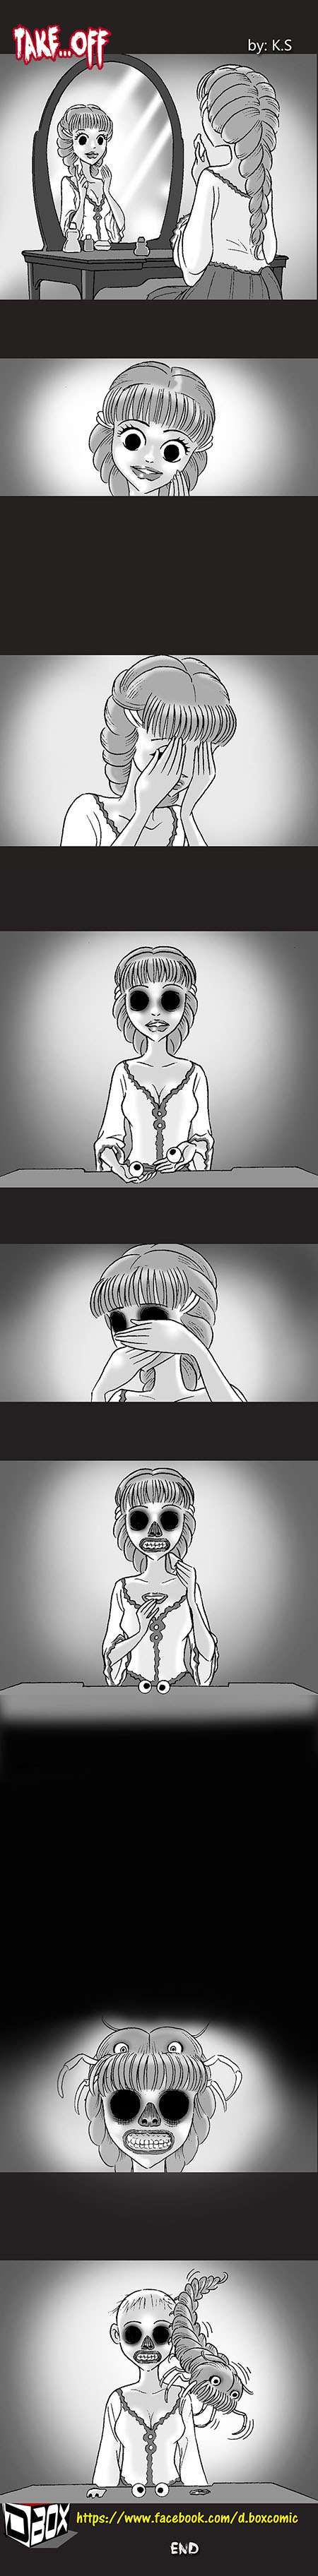 Silent Horror :: TakeOff | Tapastic Comics - image 1